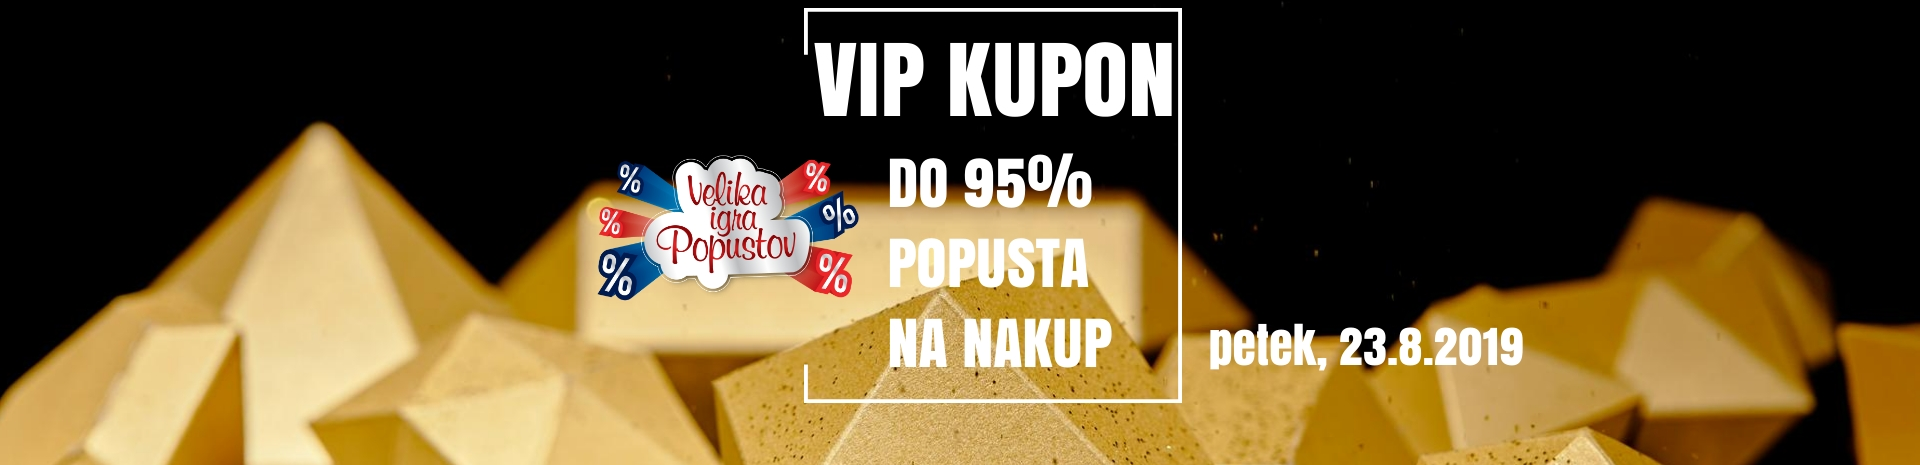 VIP KUPON 23082019